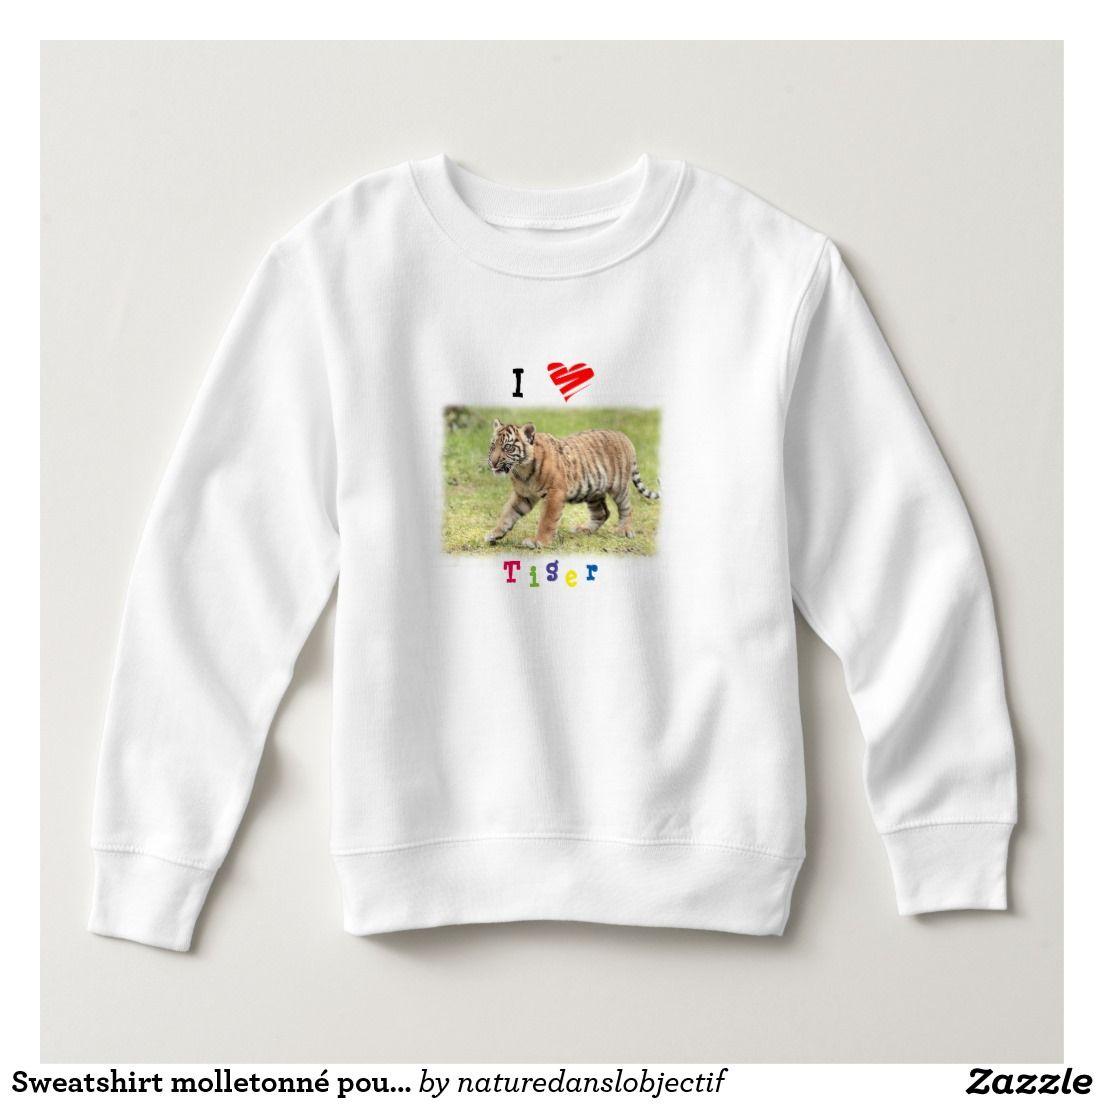 Fleece-lined Sweatshirt for child. Photo tiger